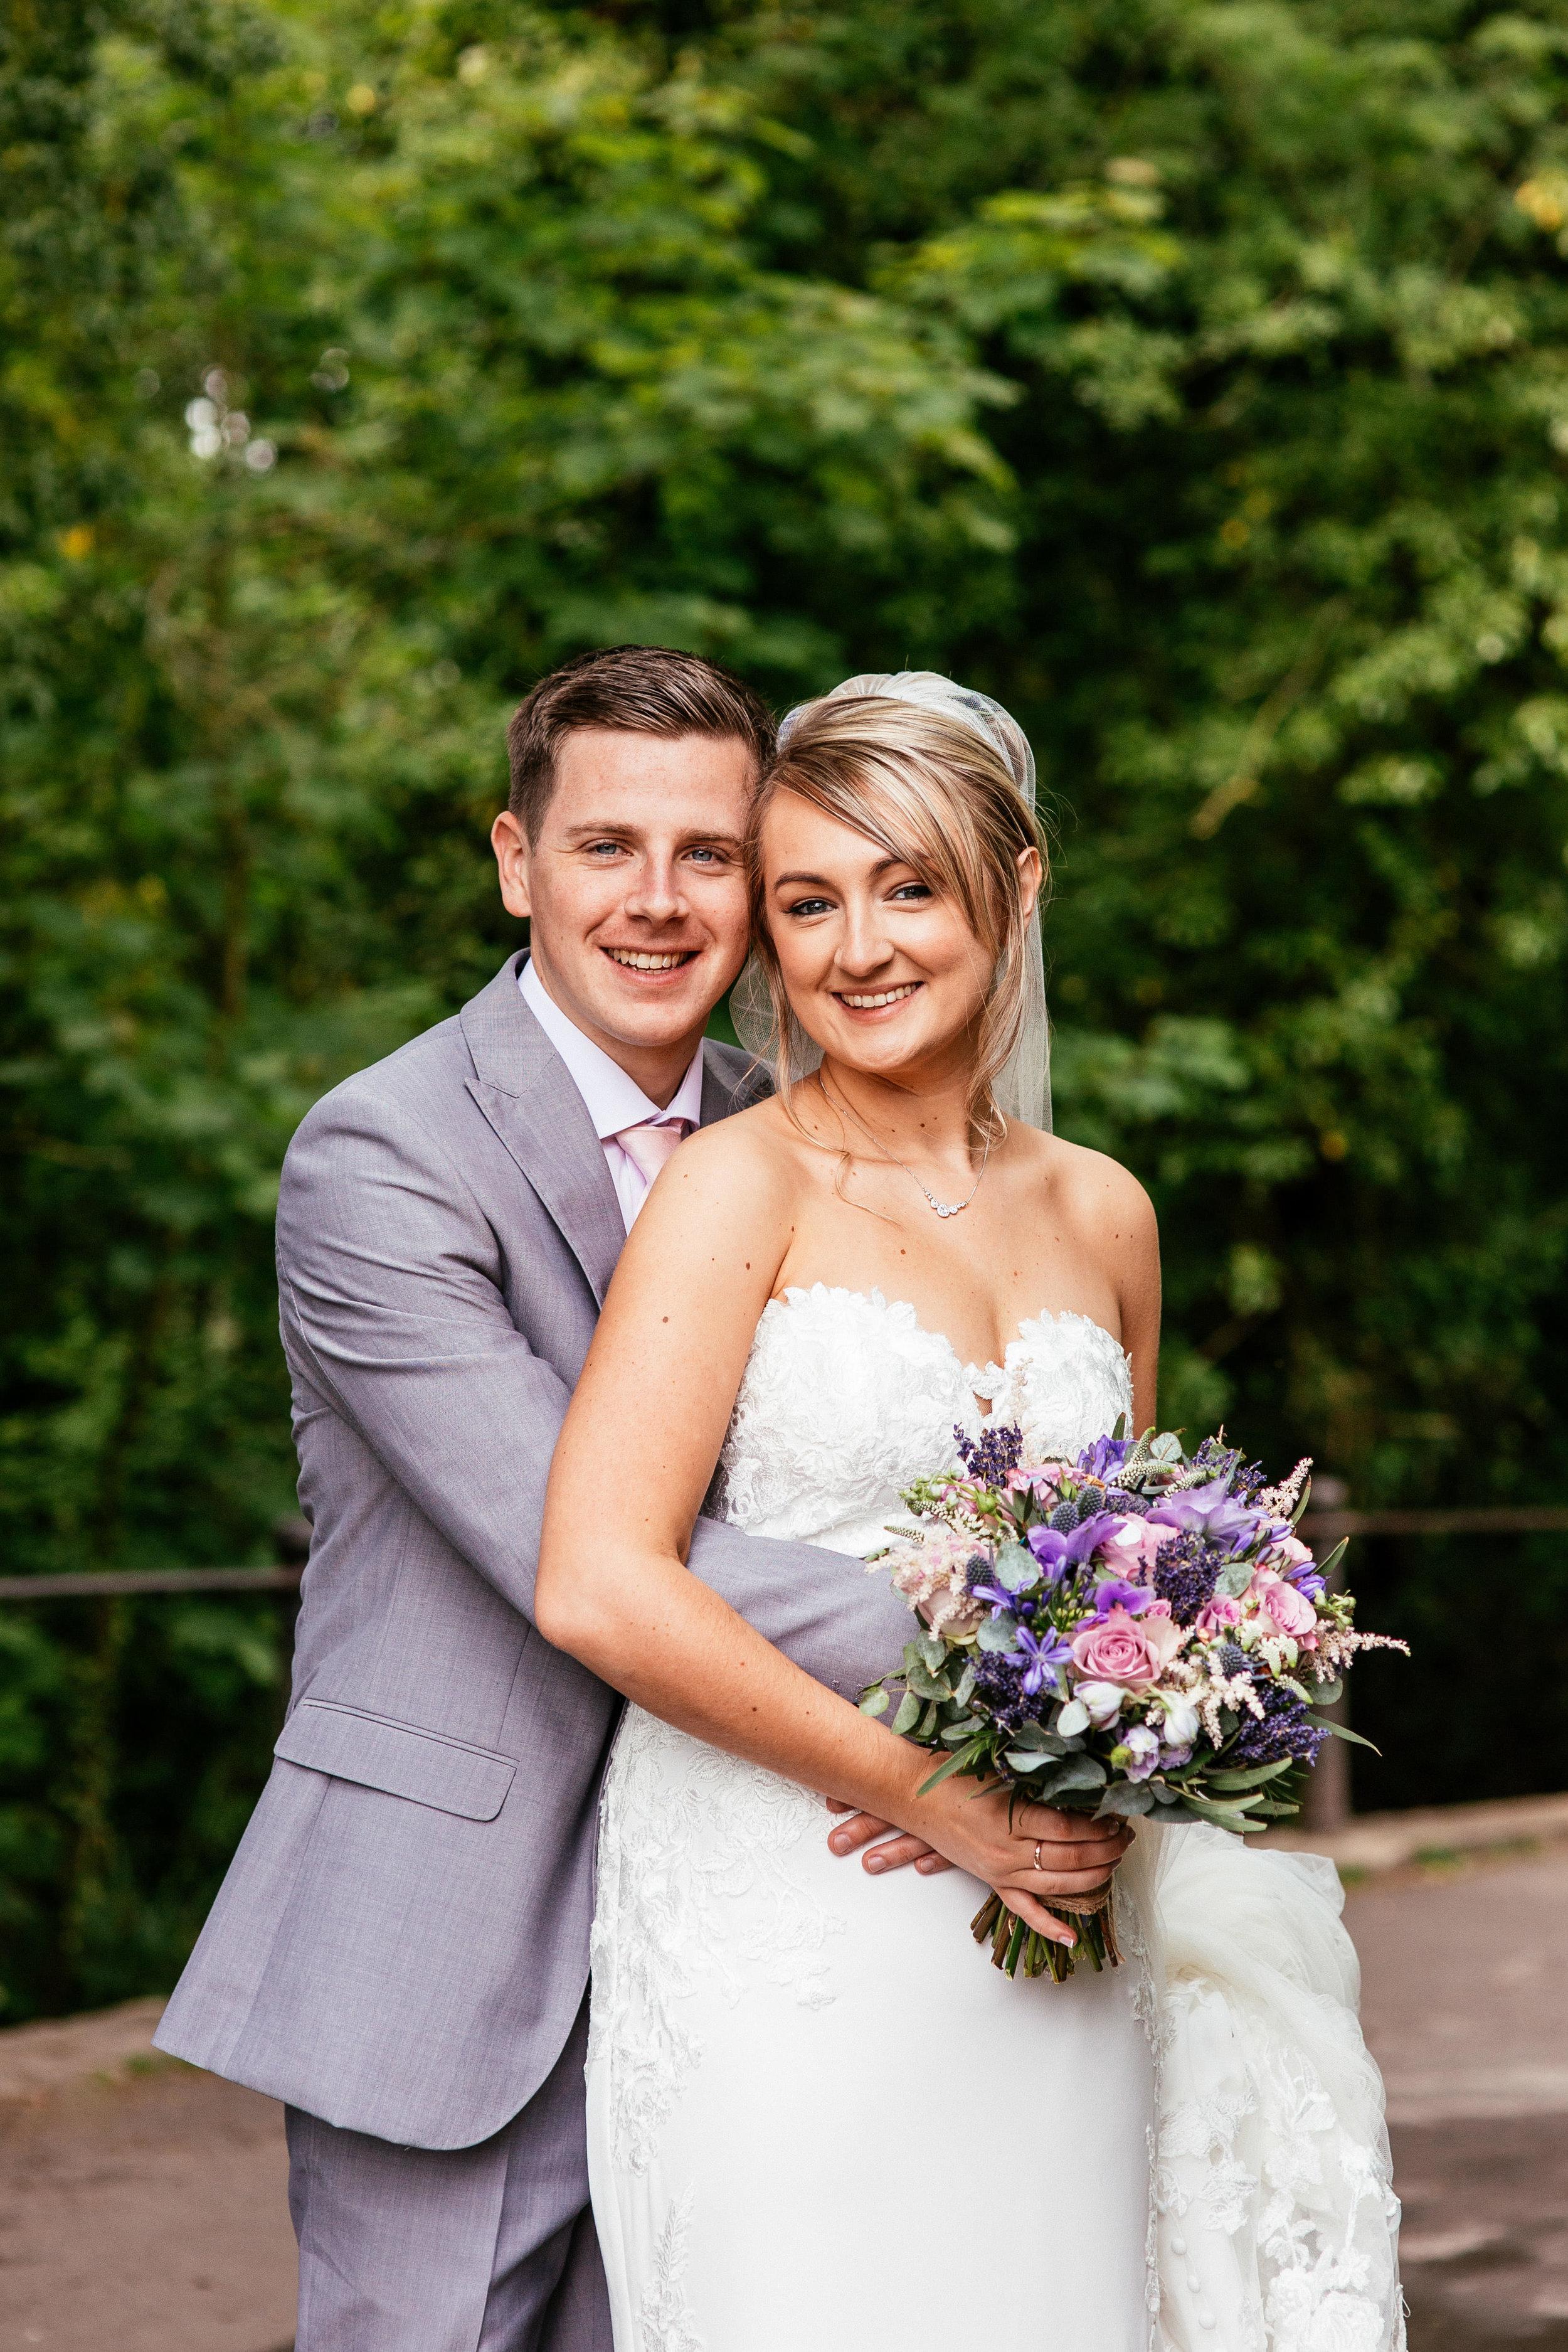 Becky-and-Sam-Wedding-Highlights-30.jpg